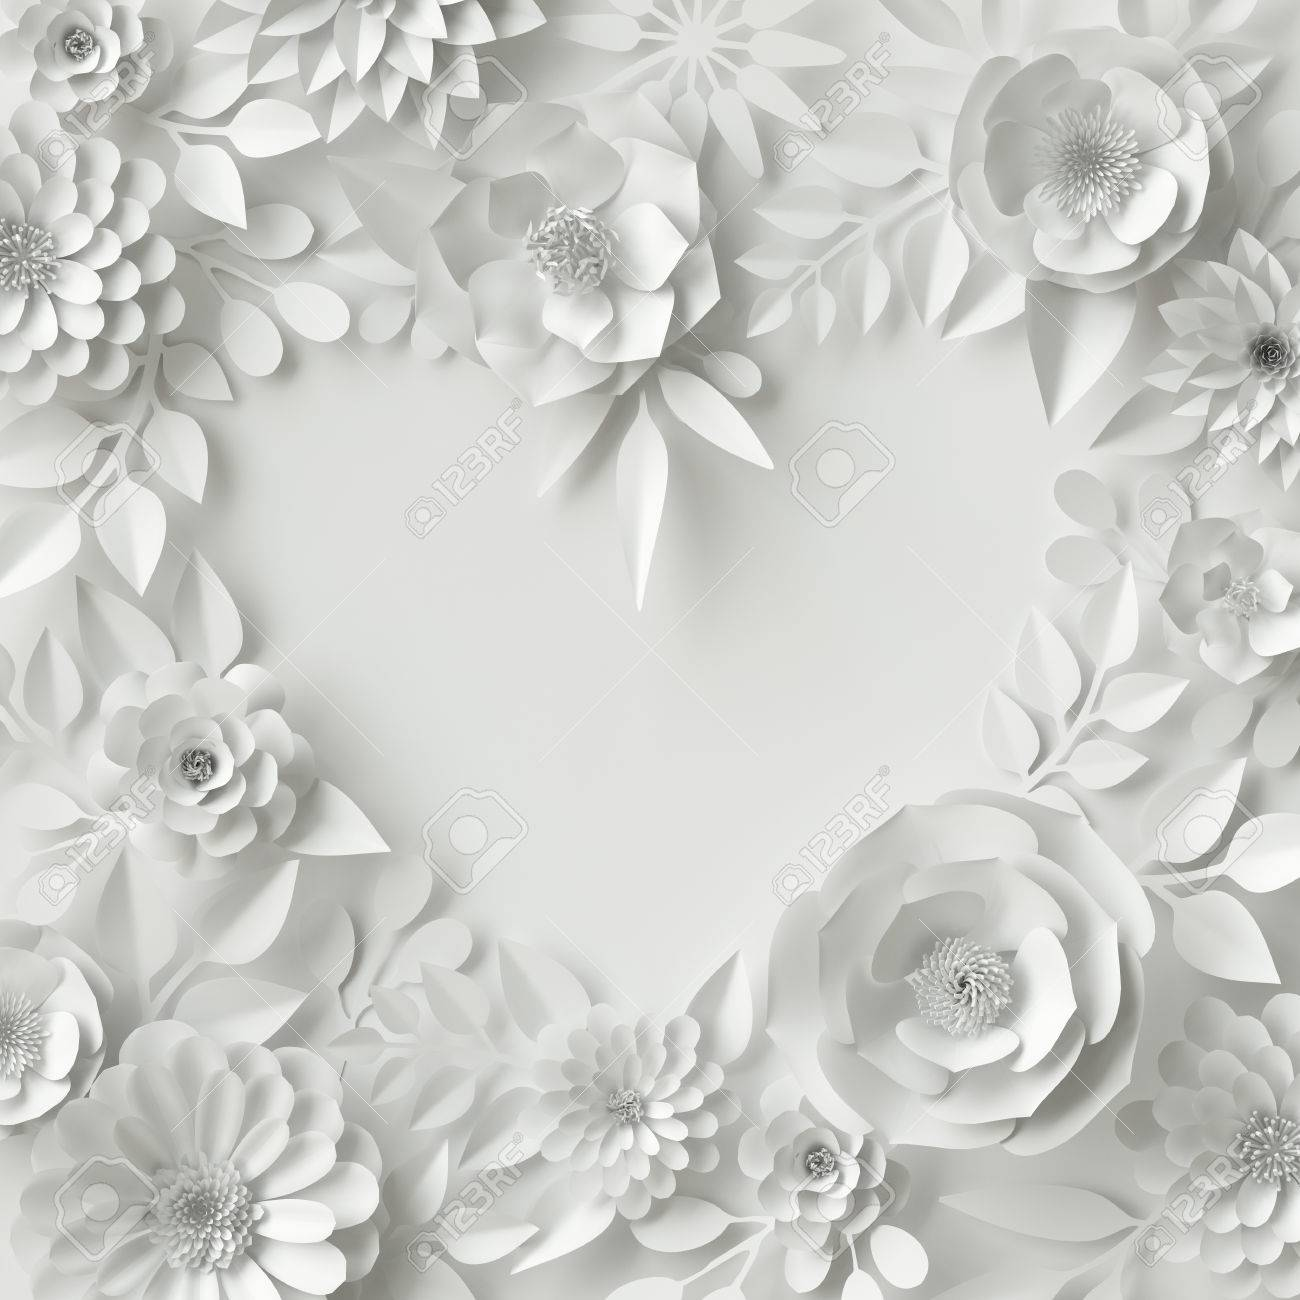 3d render digital illustration white paper flowers floral stock 3d render digital illustration white paper flowers floral background bridal bouquet mightylinksfo